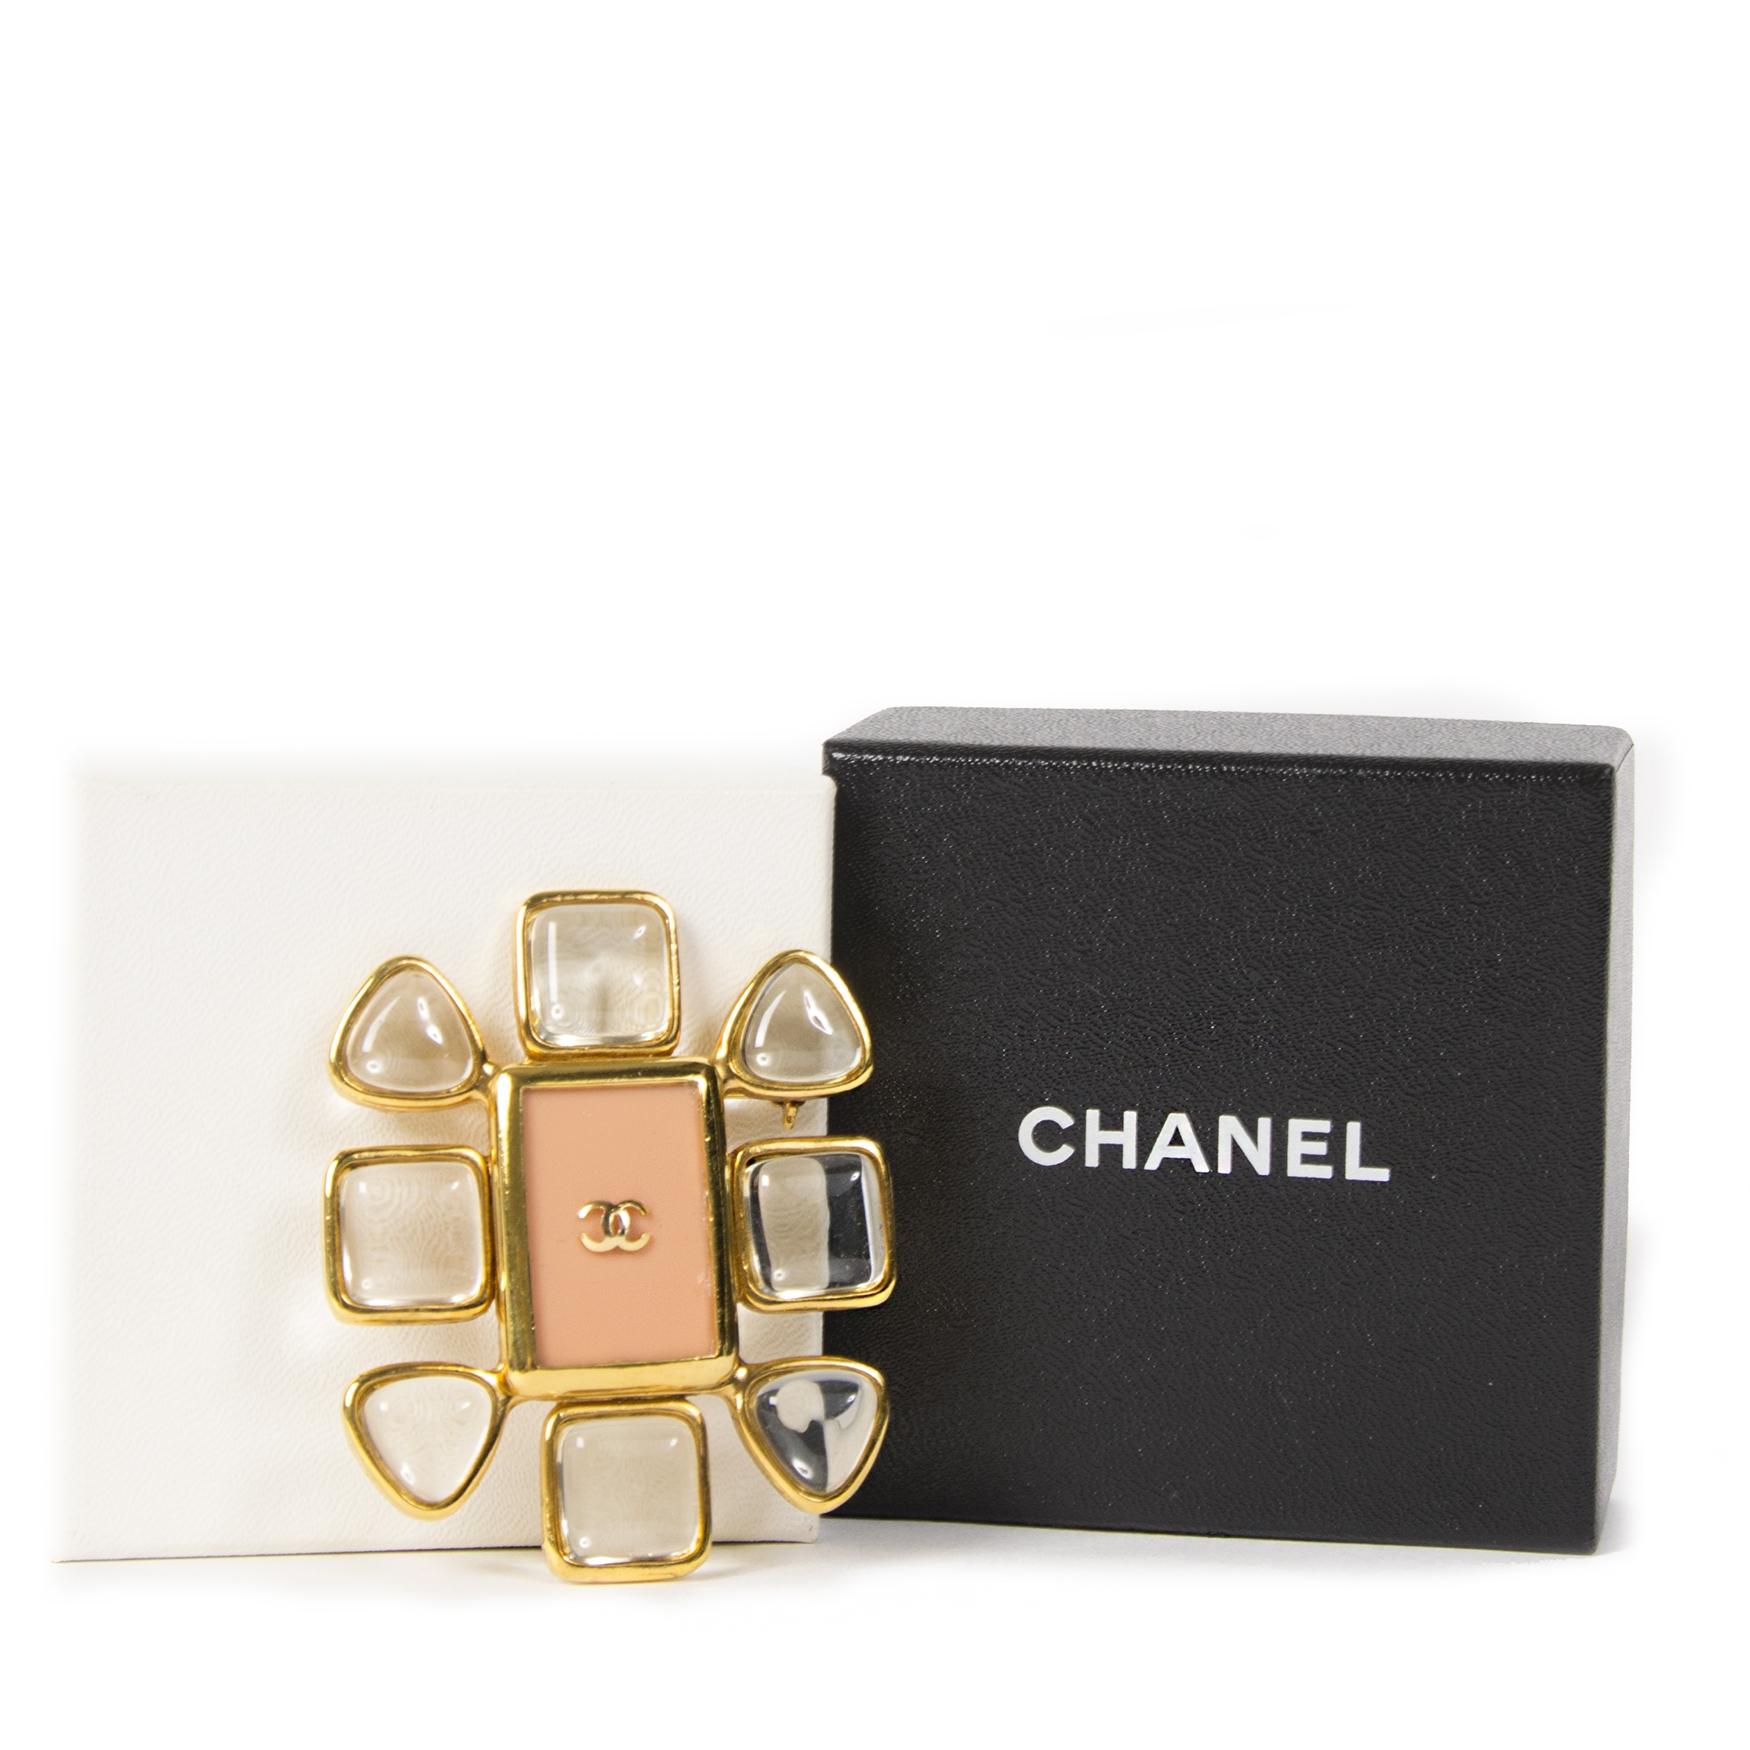 Chanel Vintage Spring 1996 Brooch